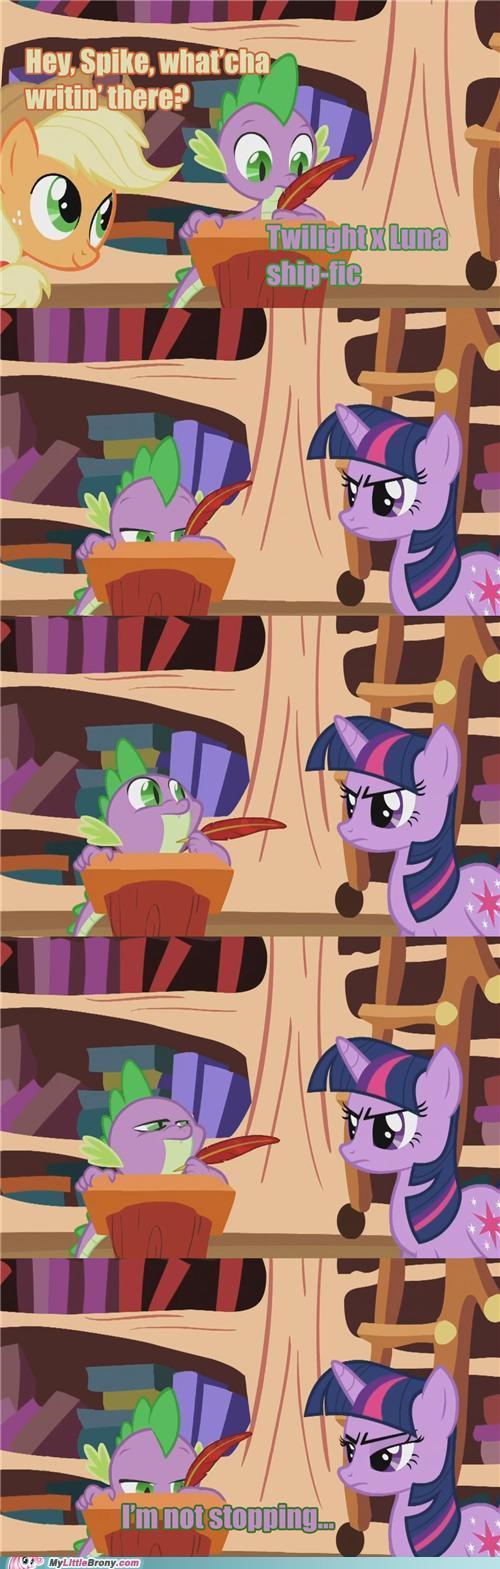 my-little-pony-friendship-is-magic-brony-spikes-latest-masterpiece1.jpg